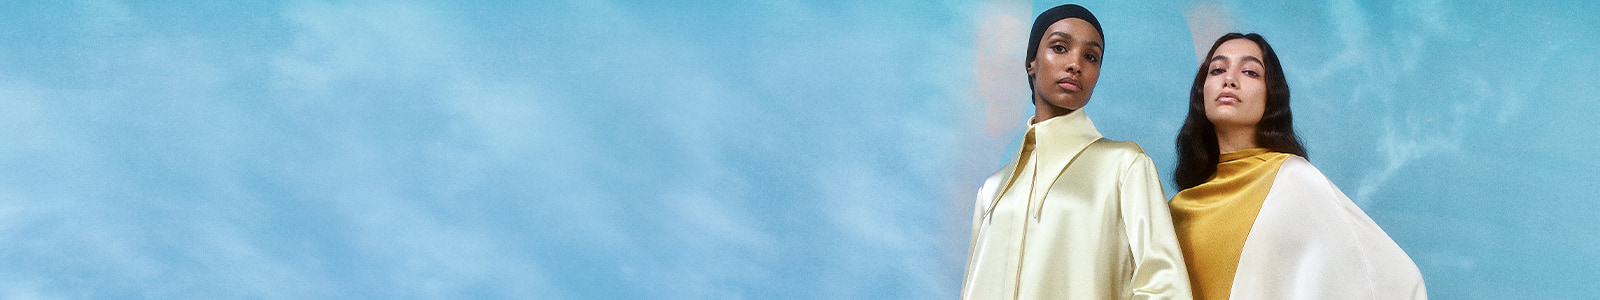 Harvey Nichols's banner